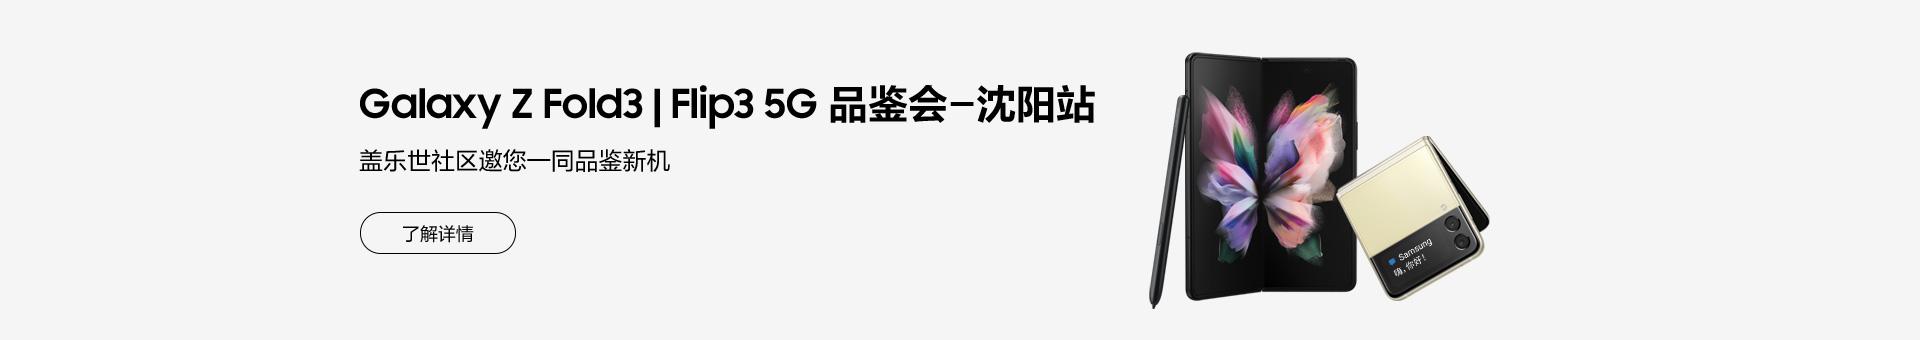 Galaxy Z Fold3| Flip3 5G品鉴会-沈阳站,邀您一同品鉴新机